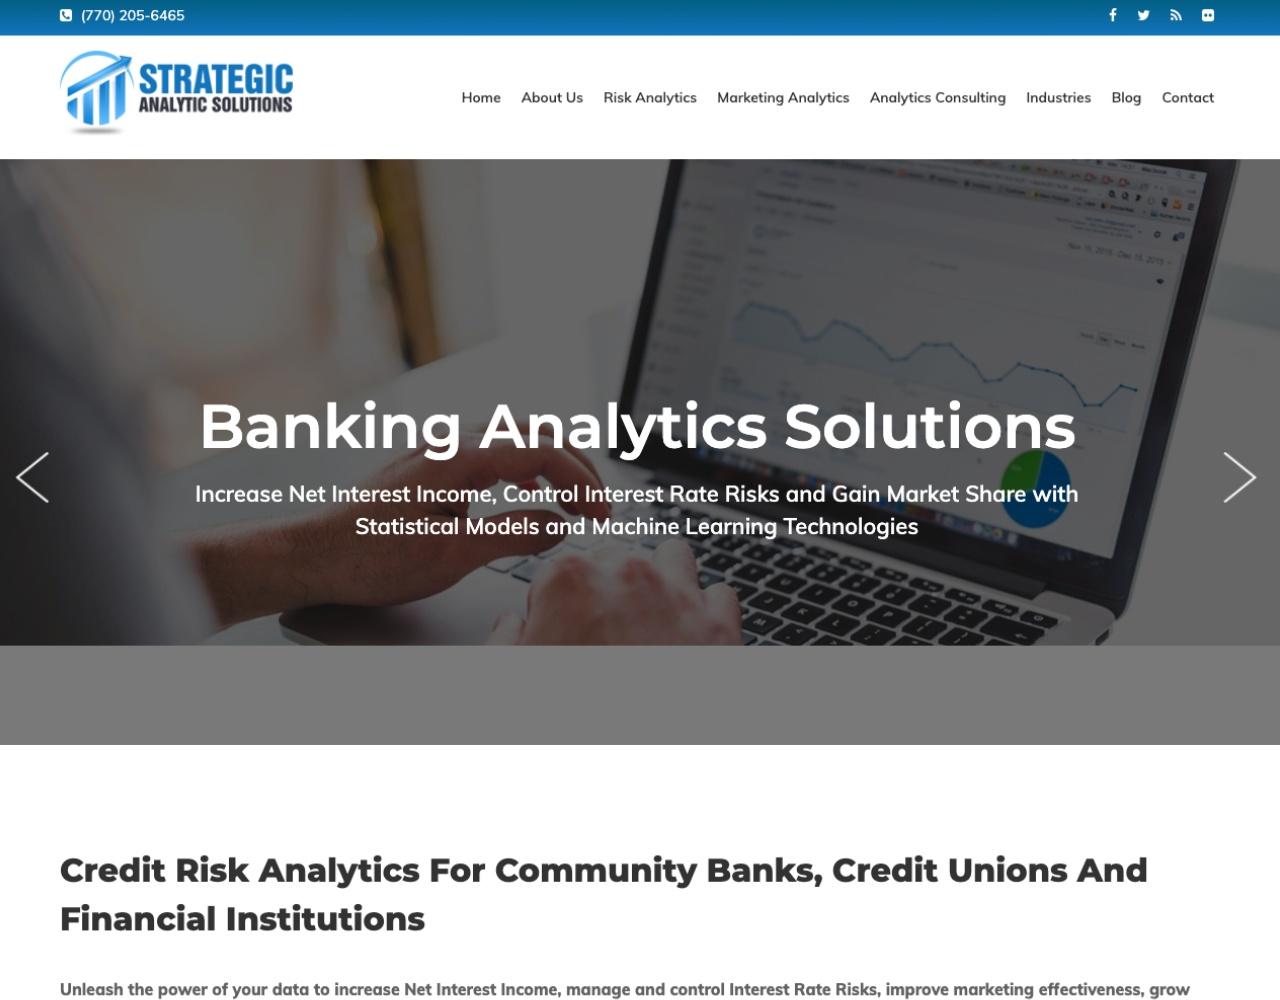 Strategic Analytic Solutions